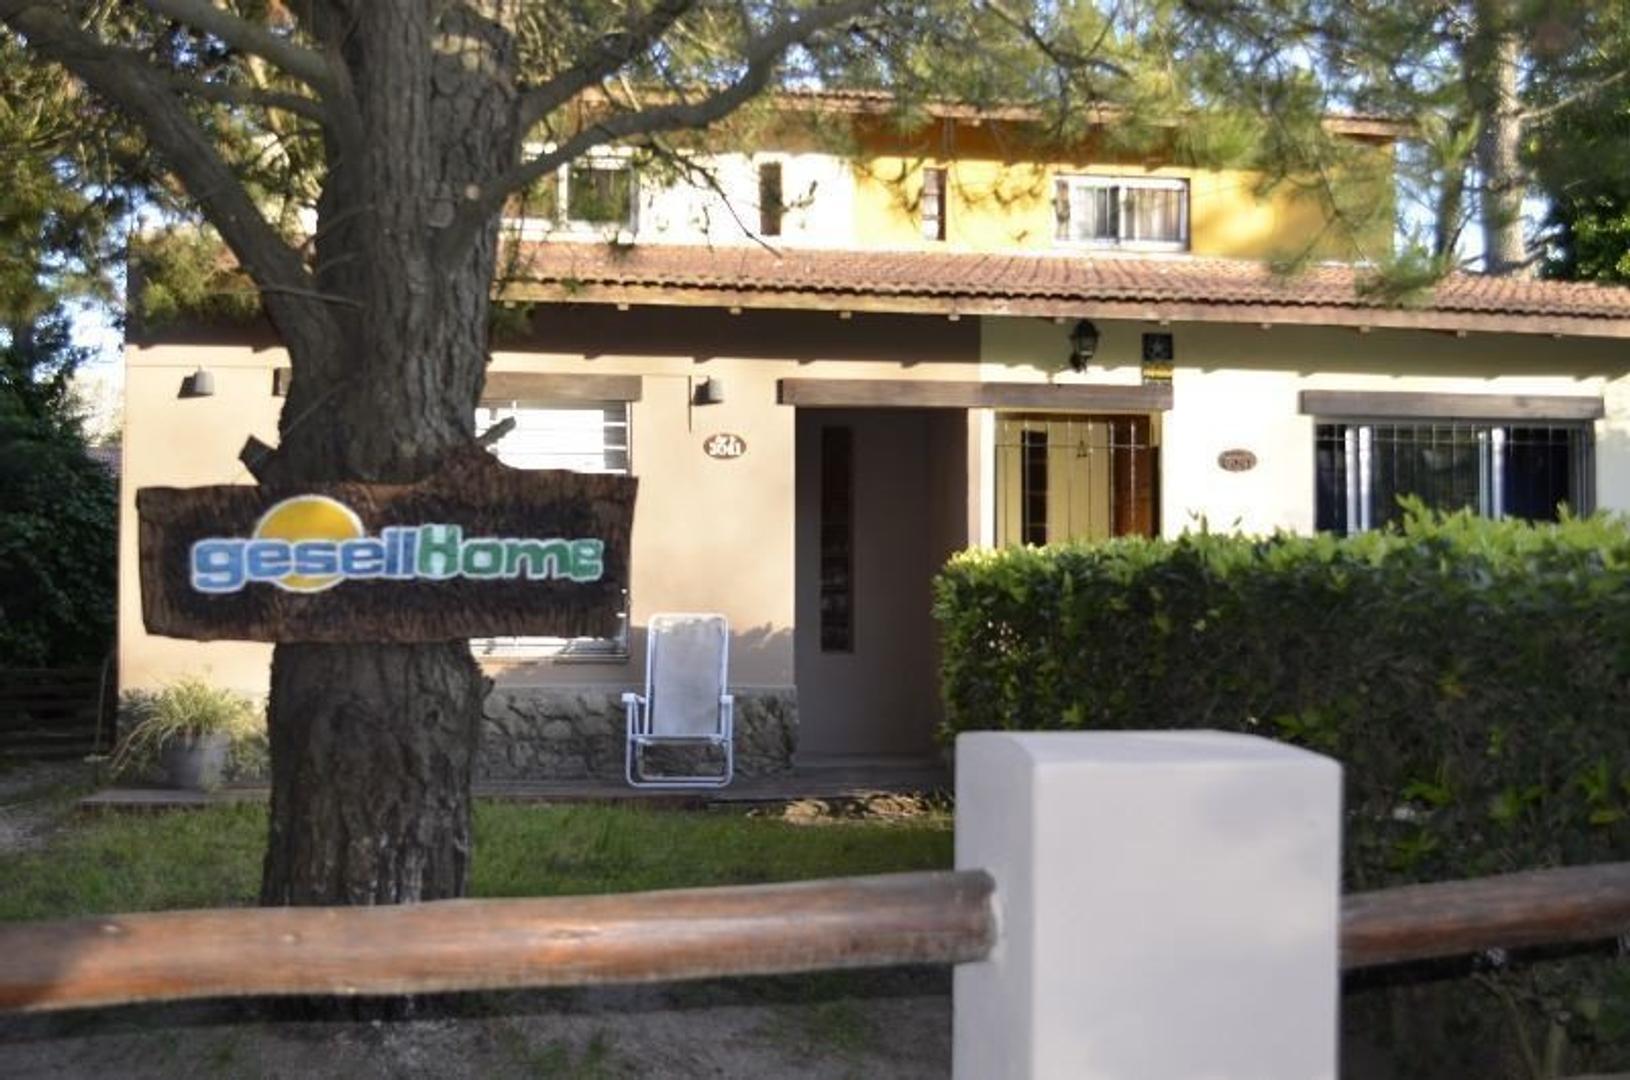 Casa GESELLHOME - Foto 21